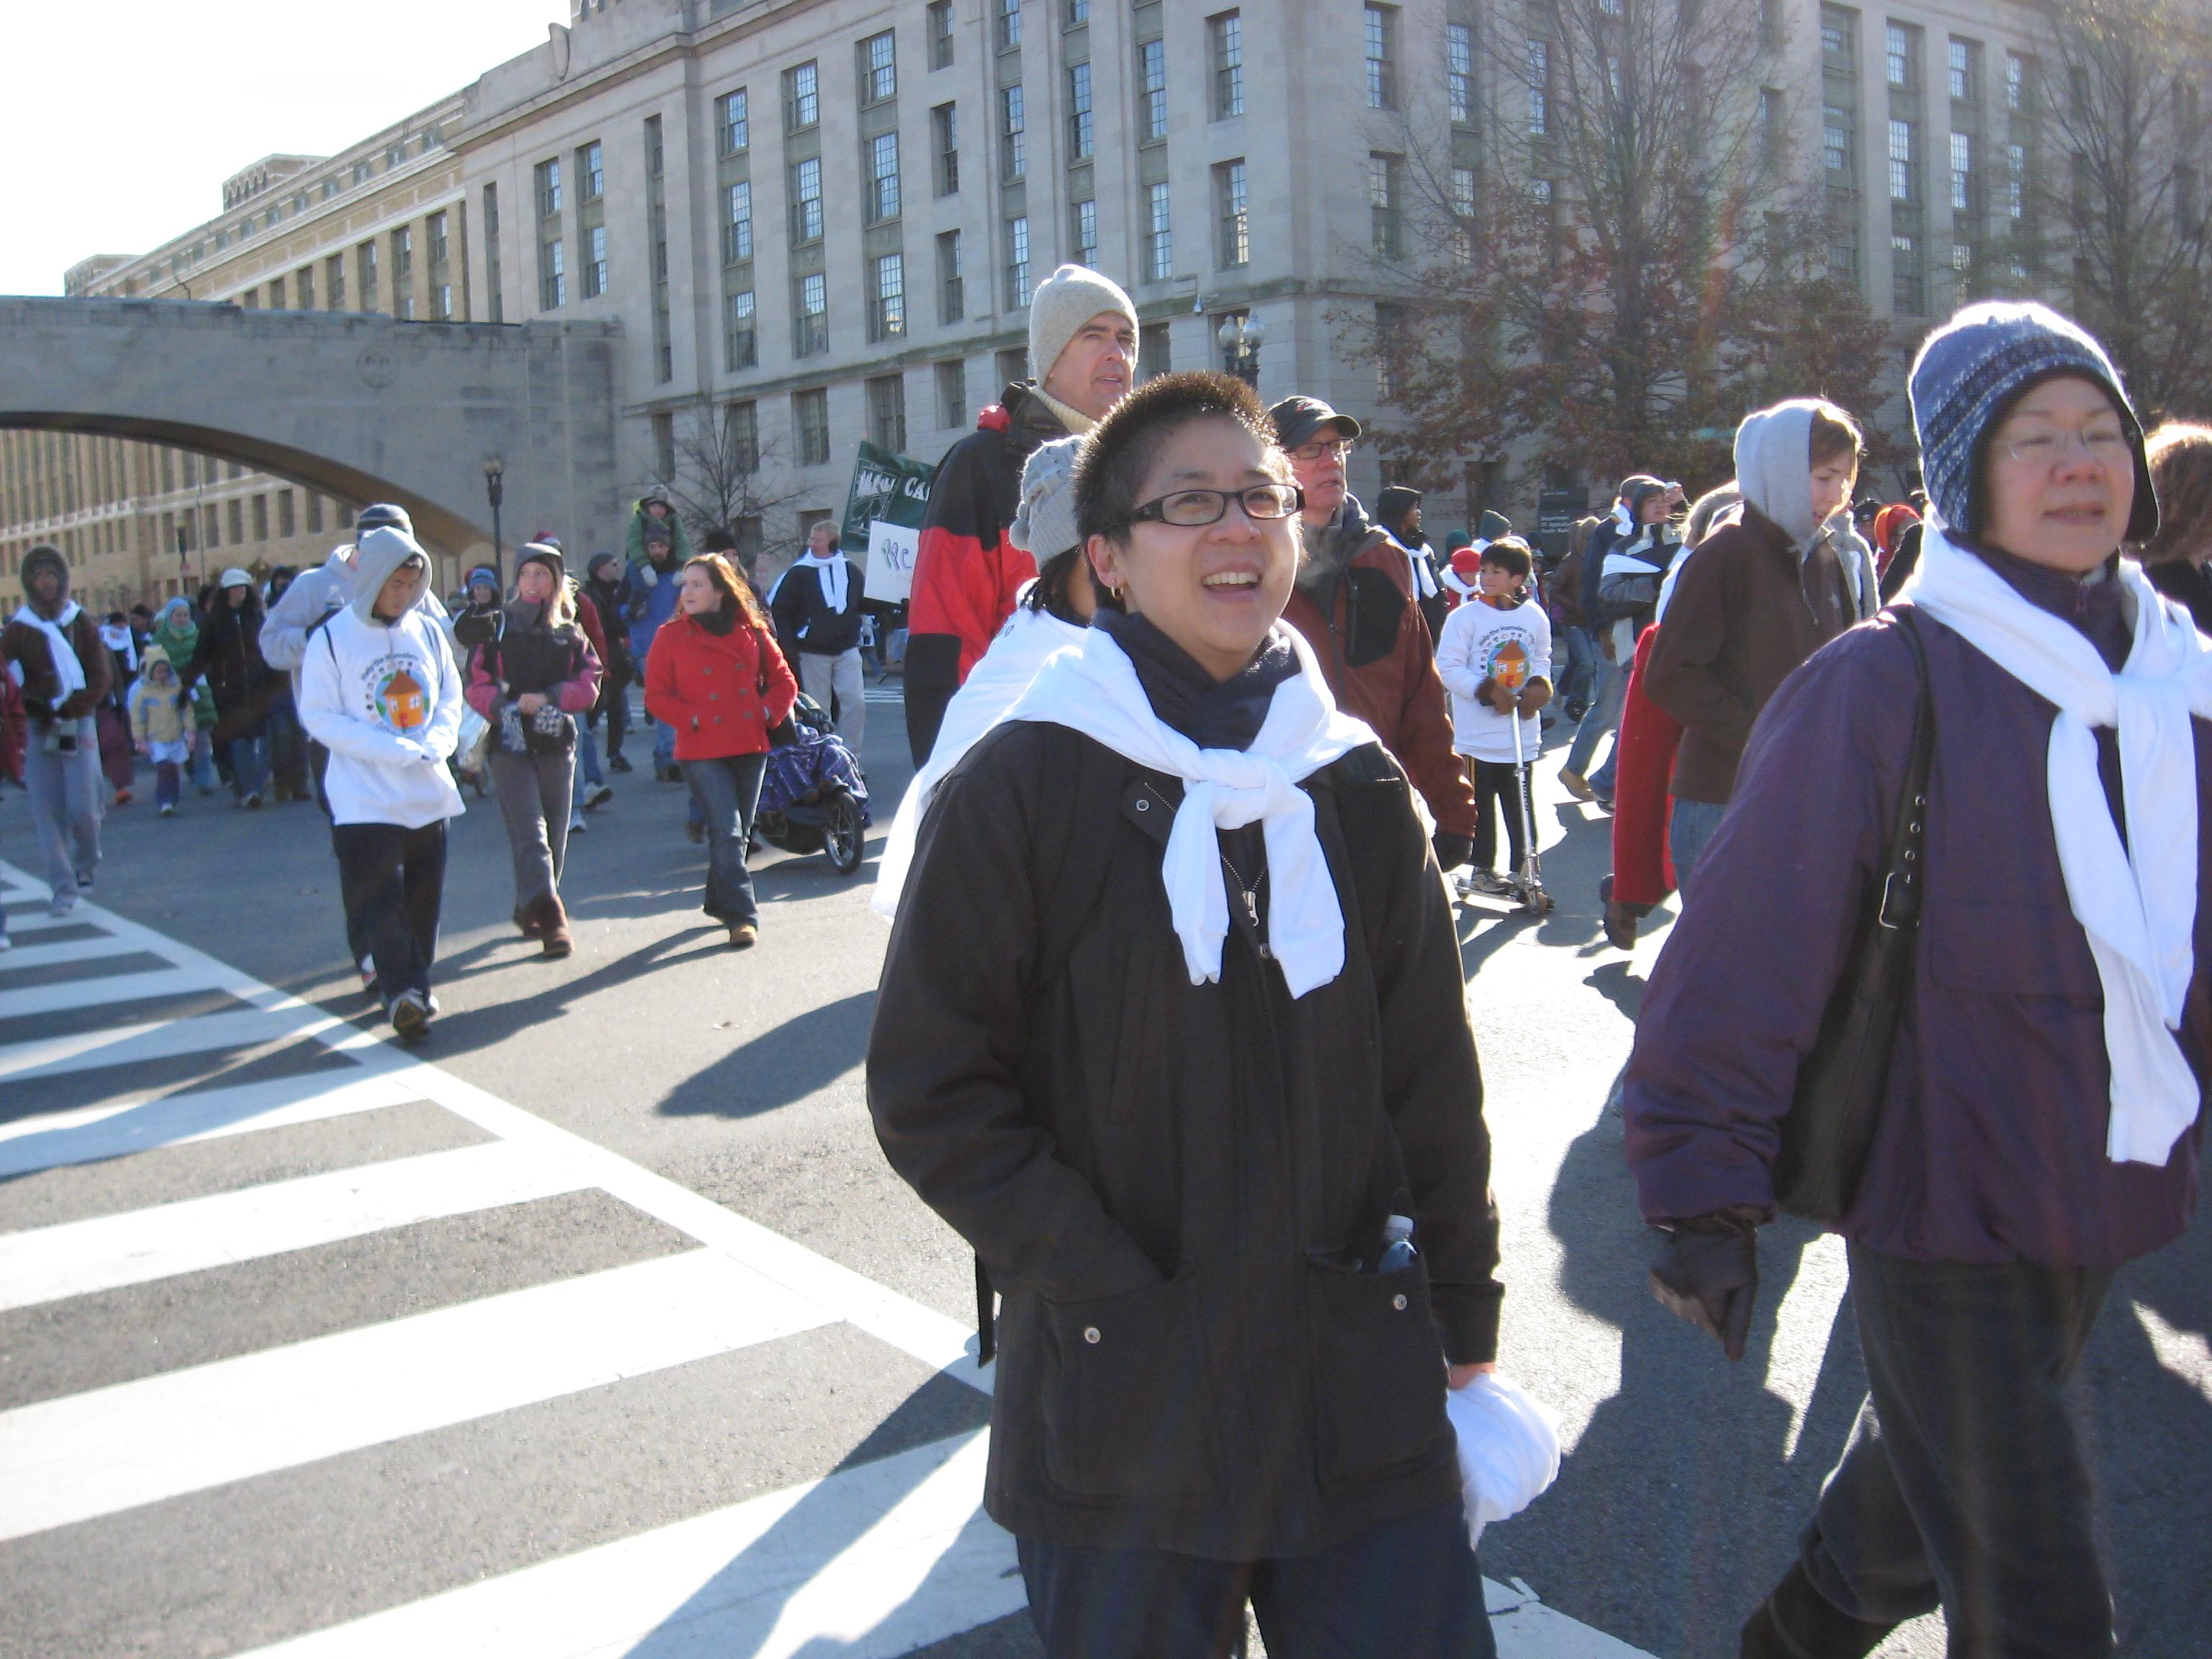 Christina & Ru Walking Fast to Stay Warm